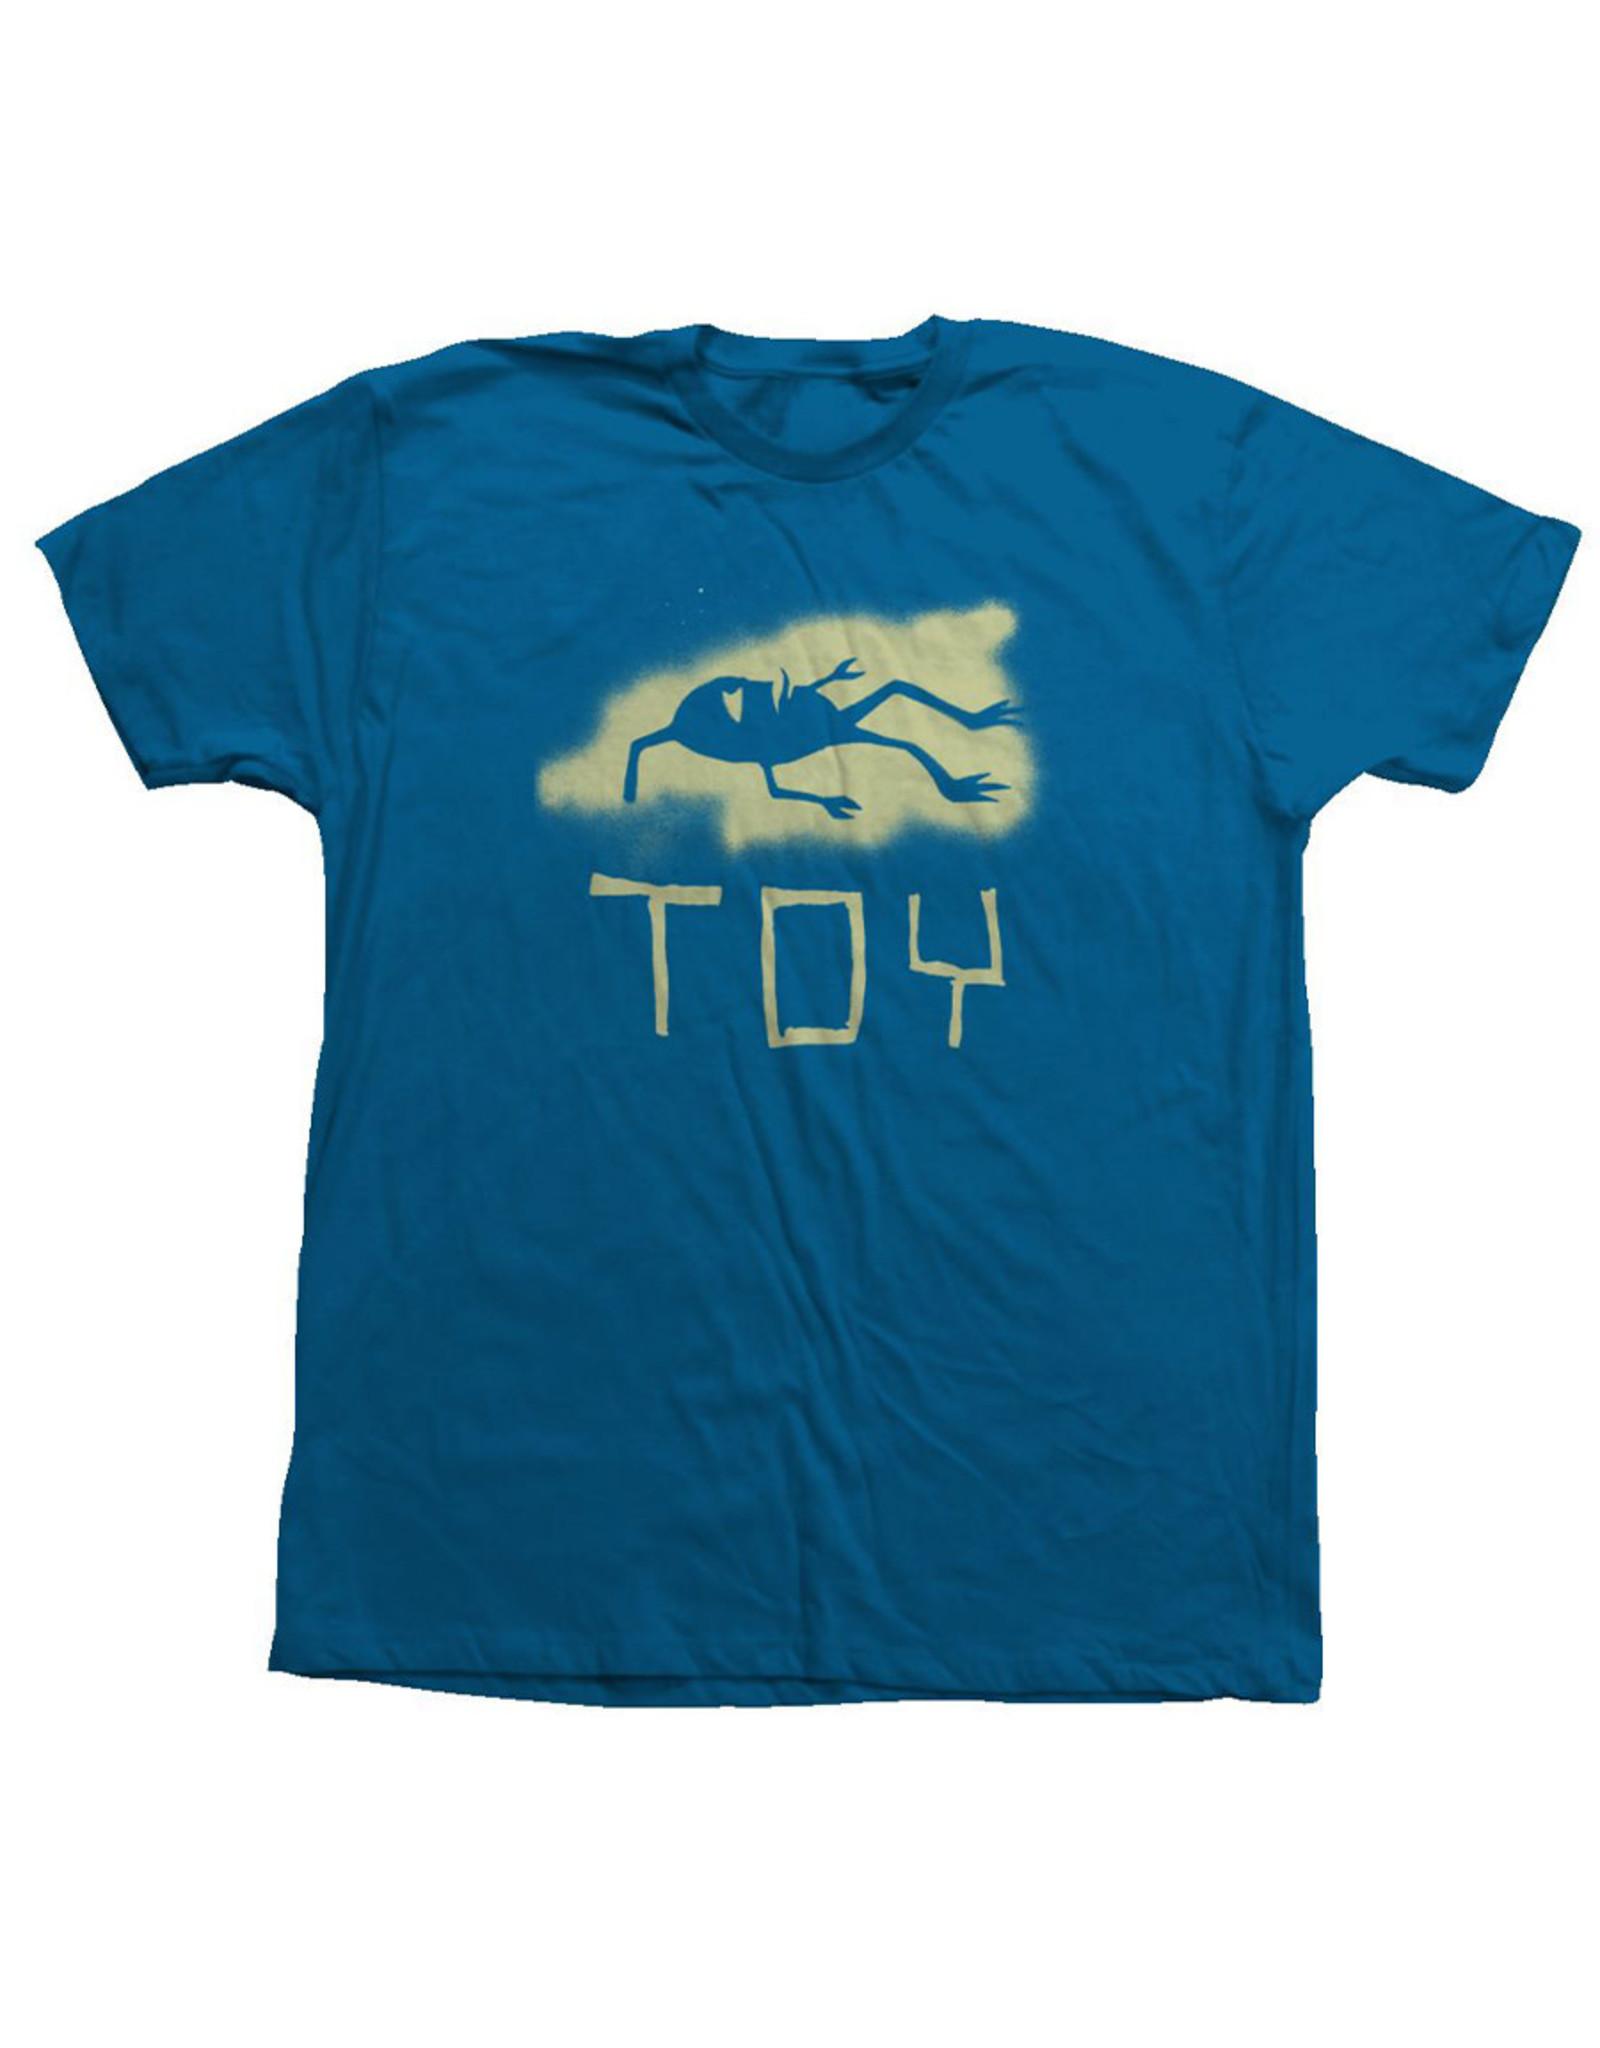 Toy Machine Toy Machine Tee T O Y S/S (Royal)